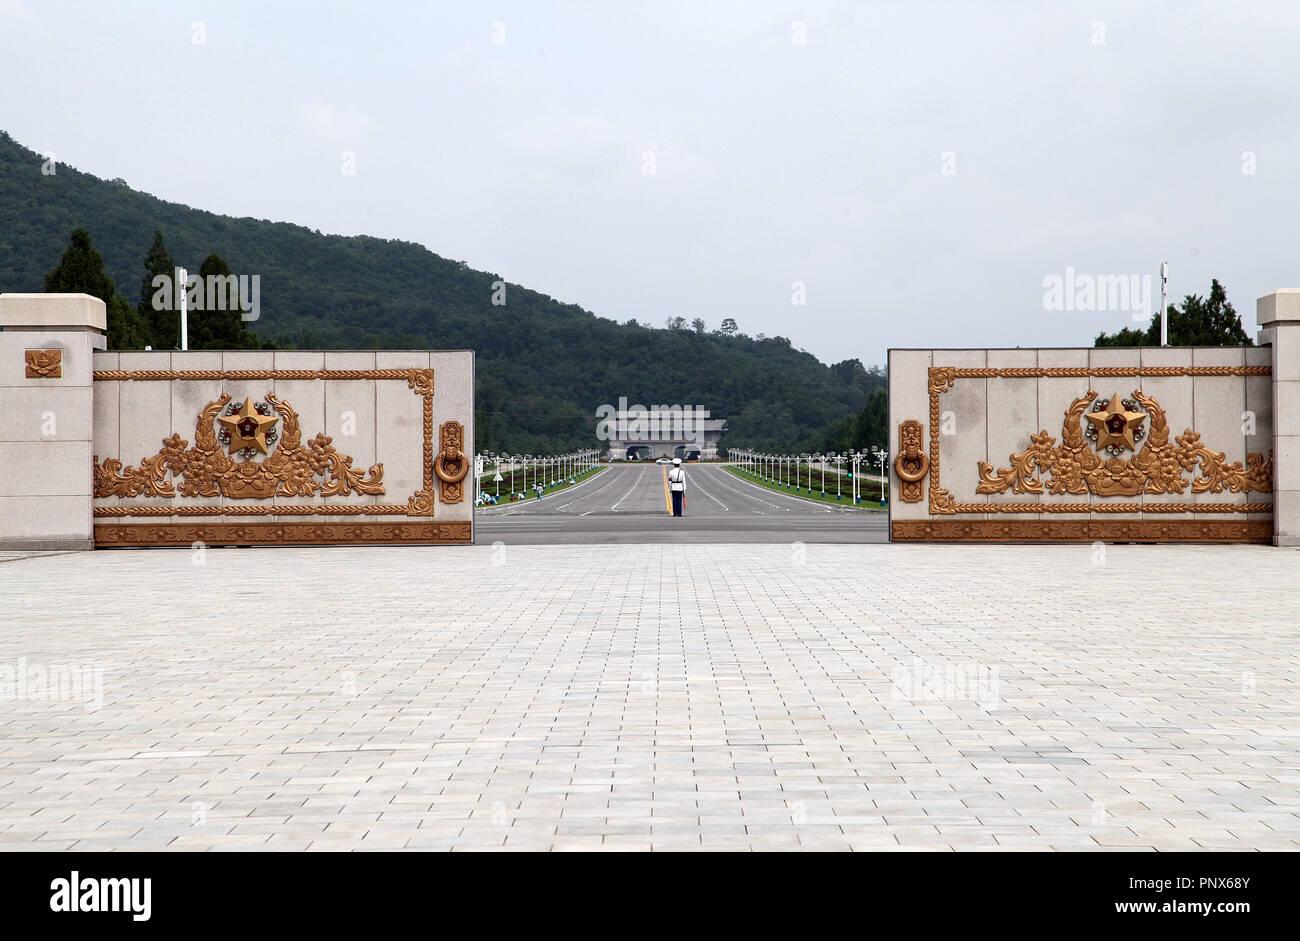 Kumsusan Palace of the Sun in Pyongyang - Stock Image